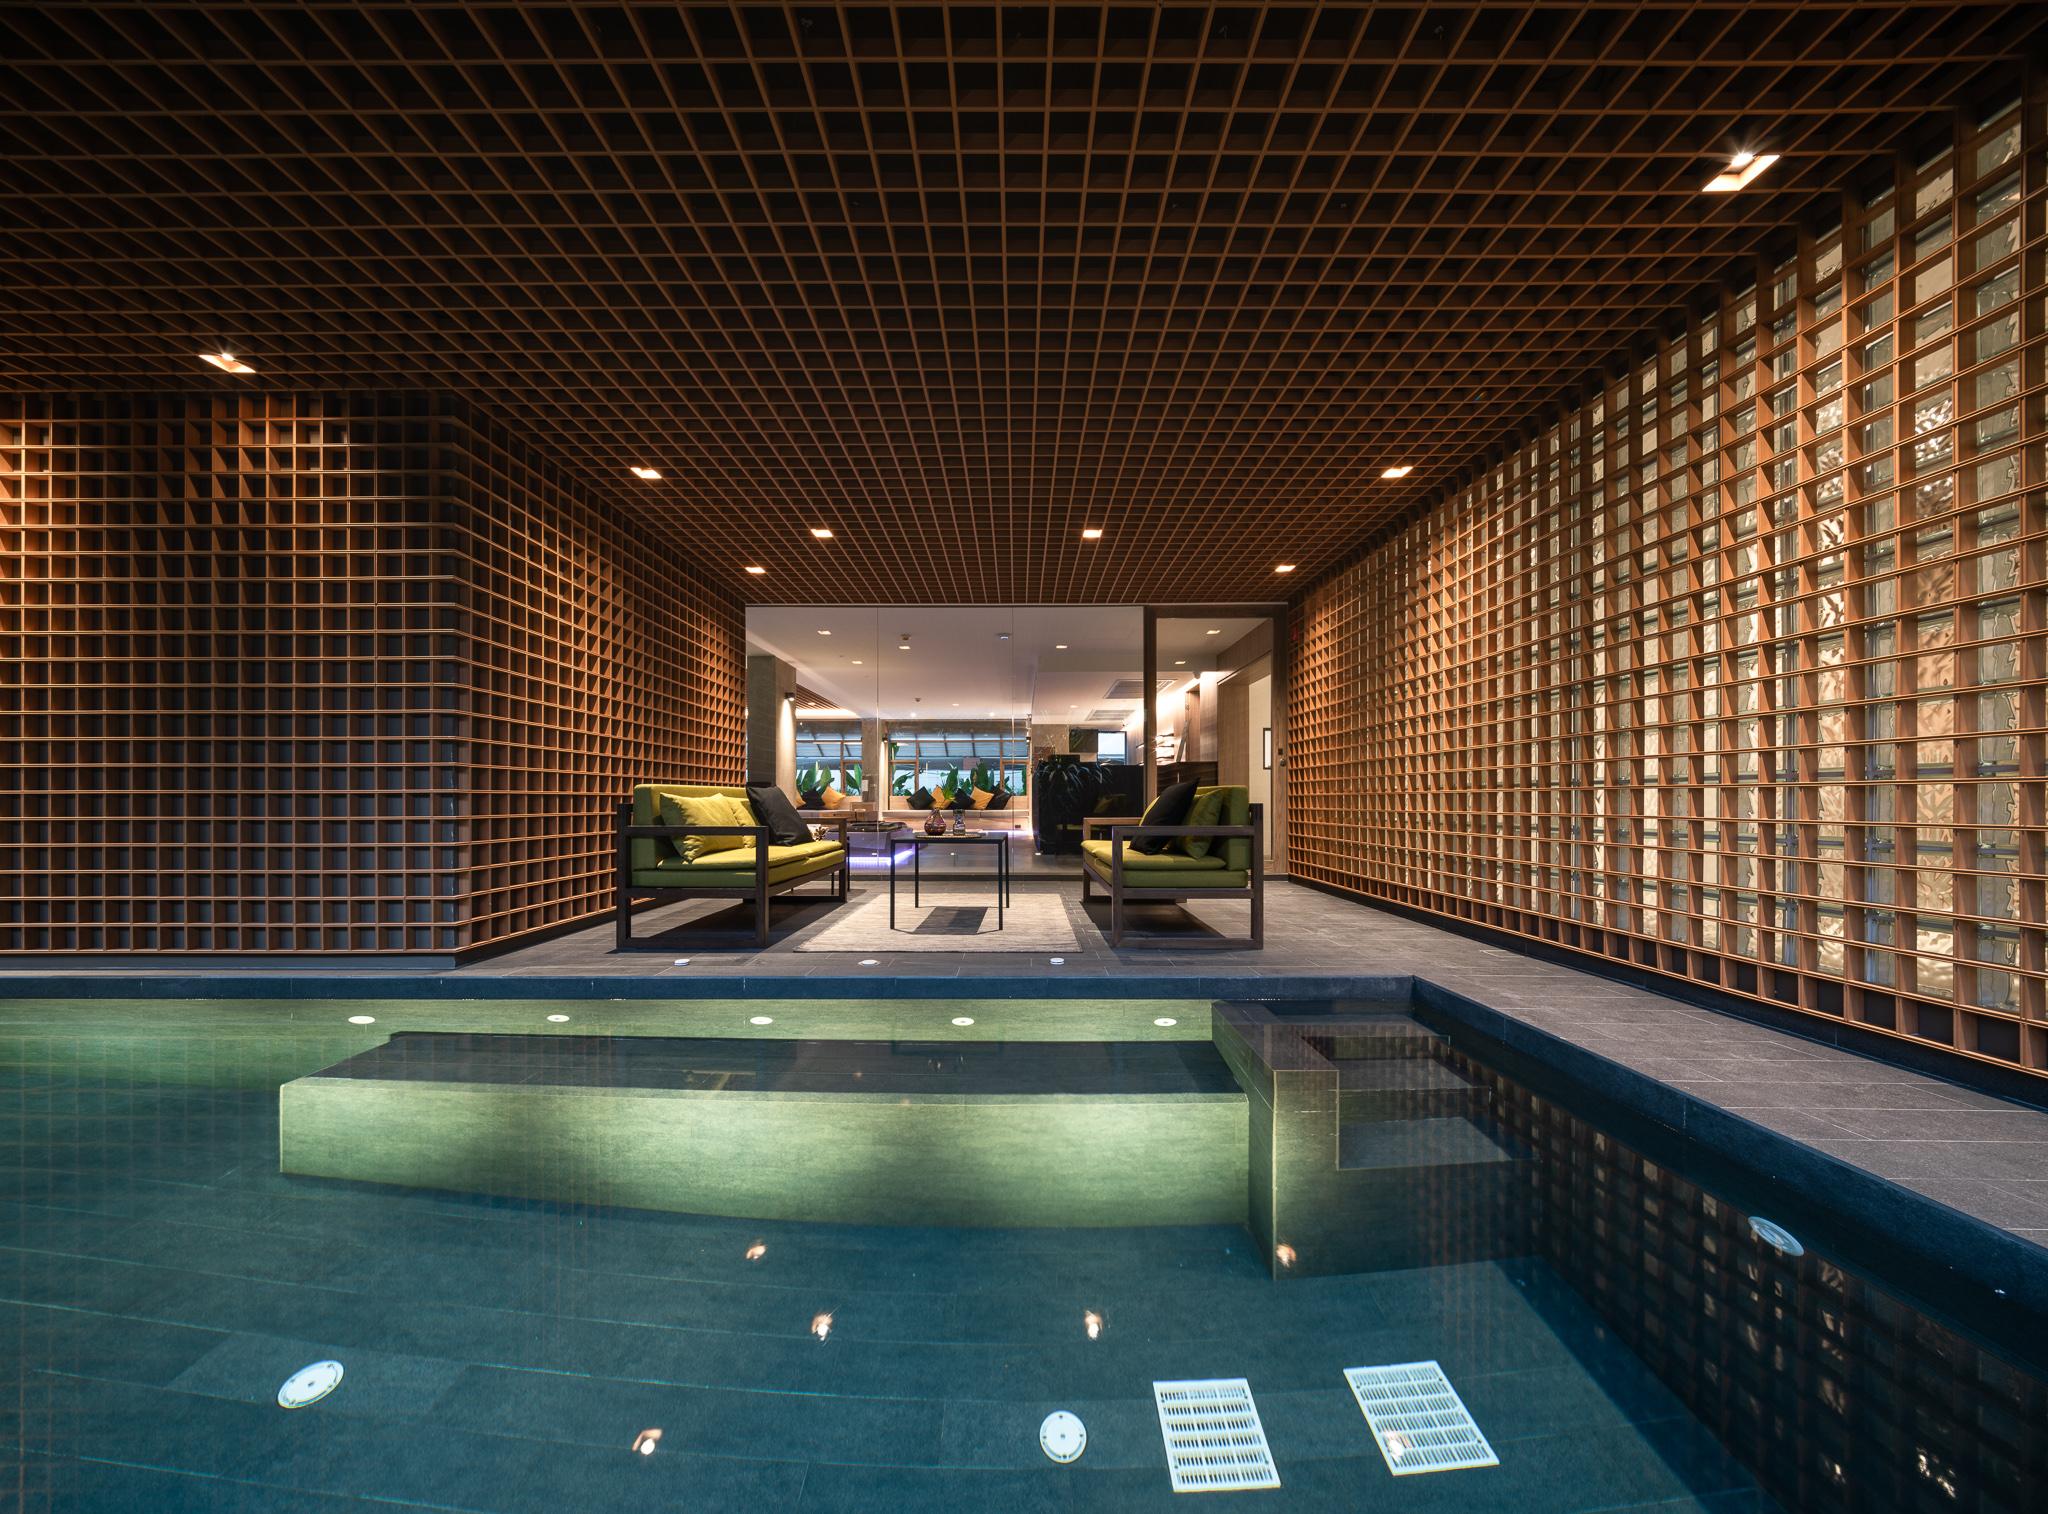 Budget Resorts